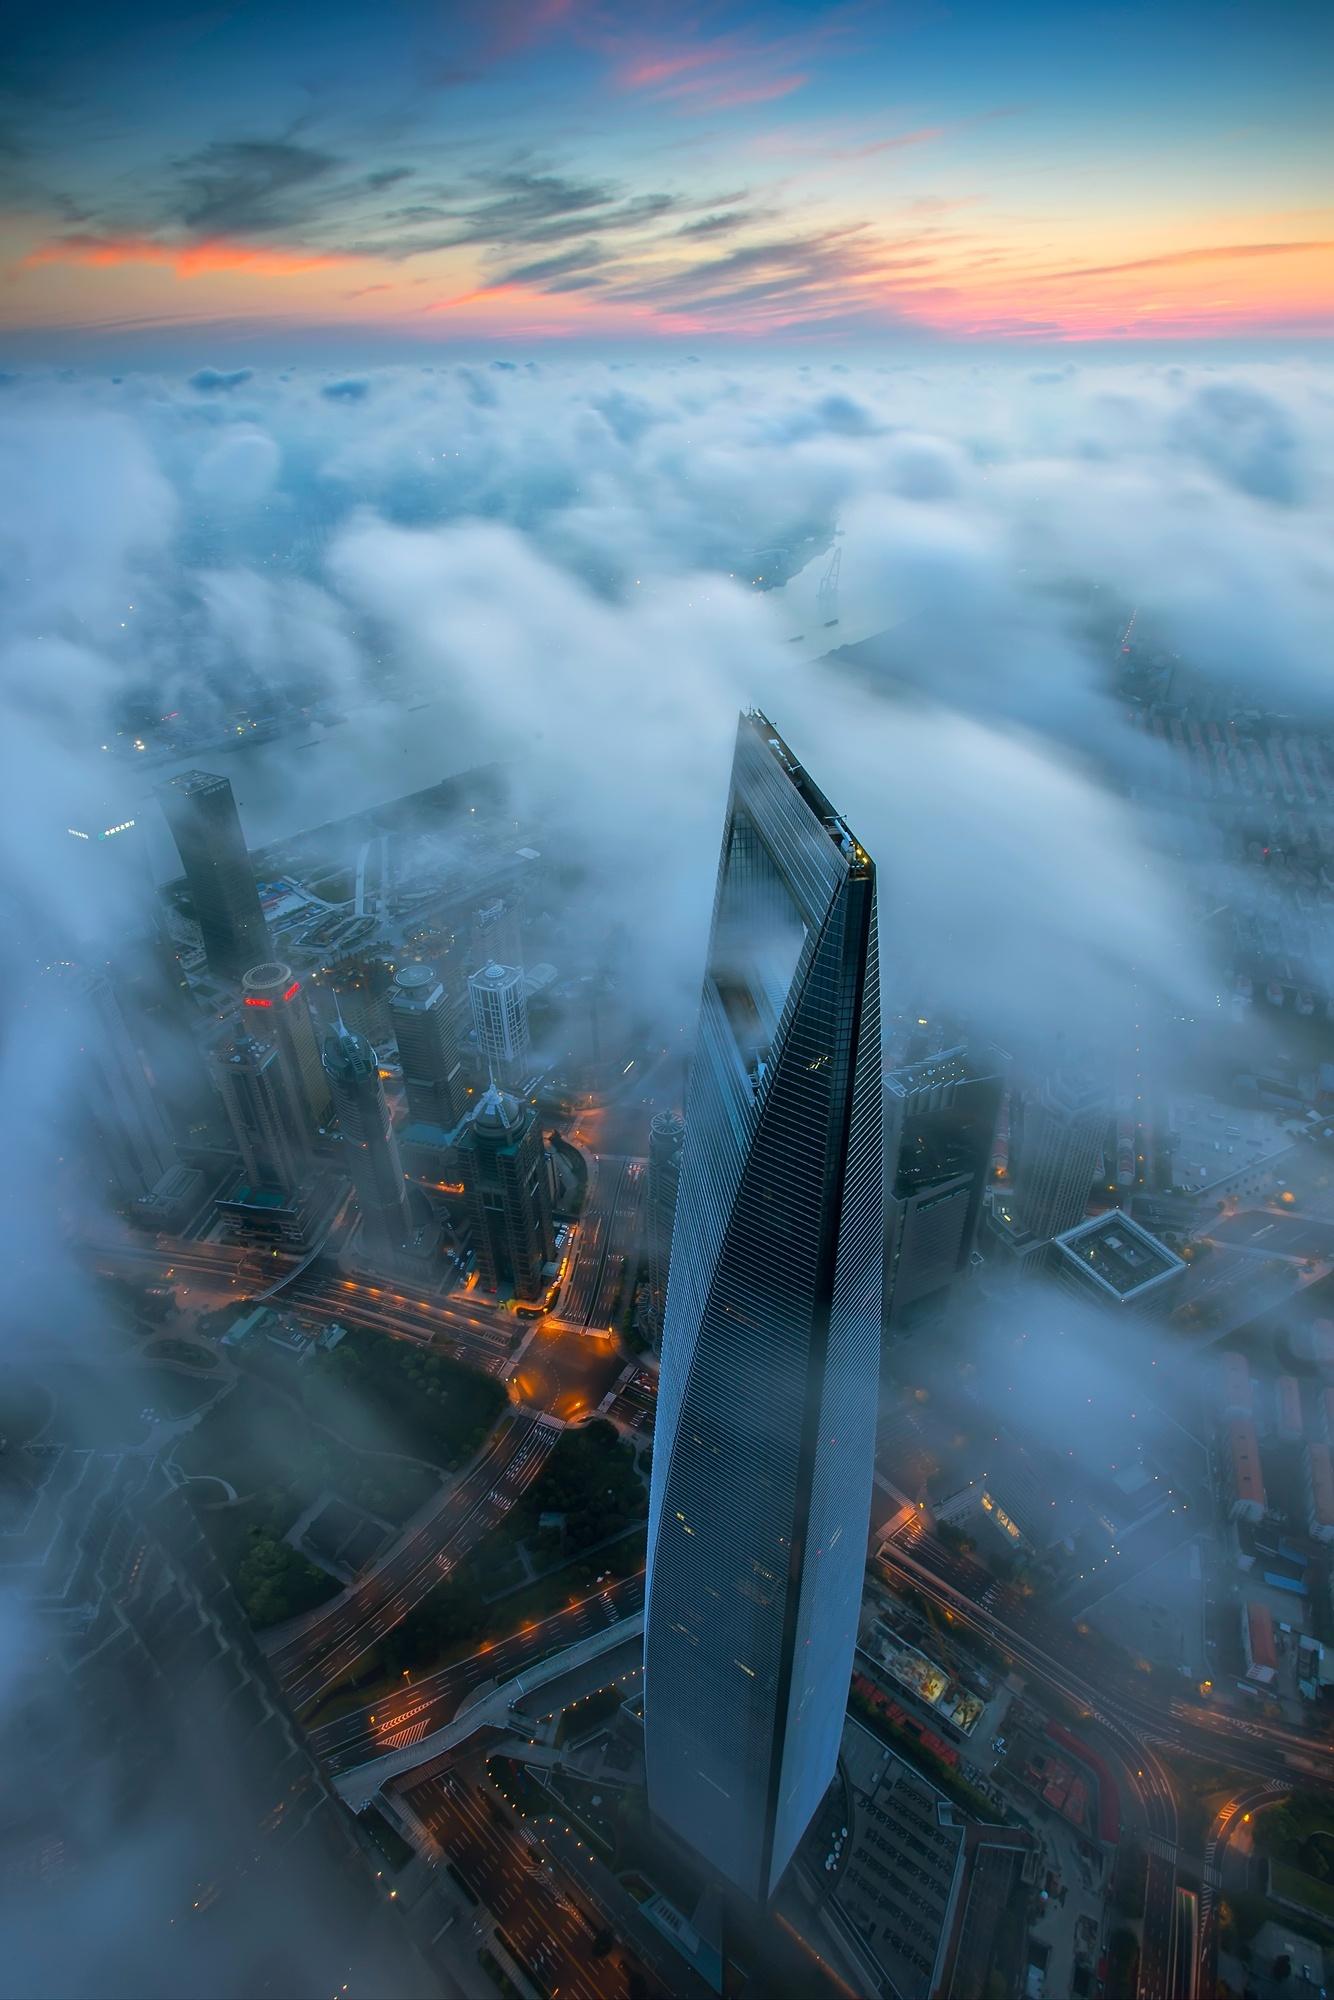 shanghai world financial center fog sunset